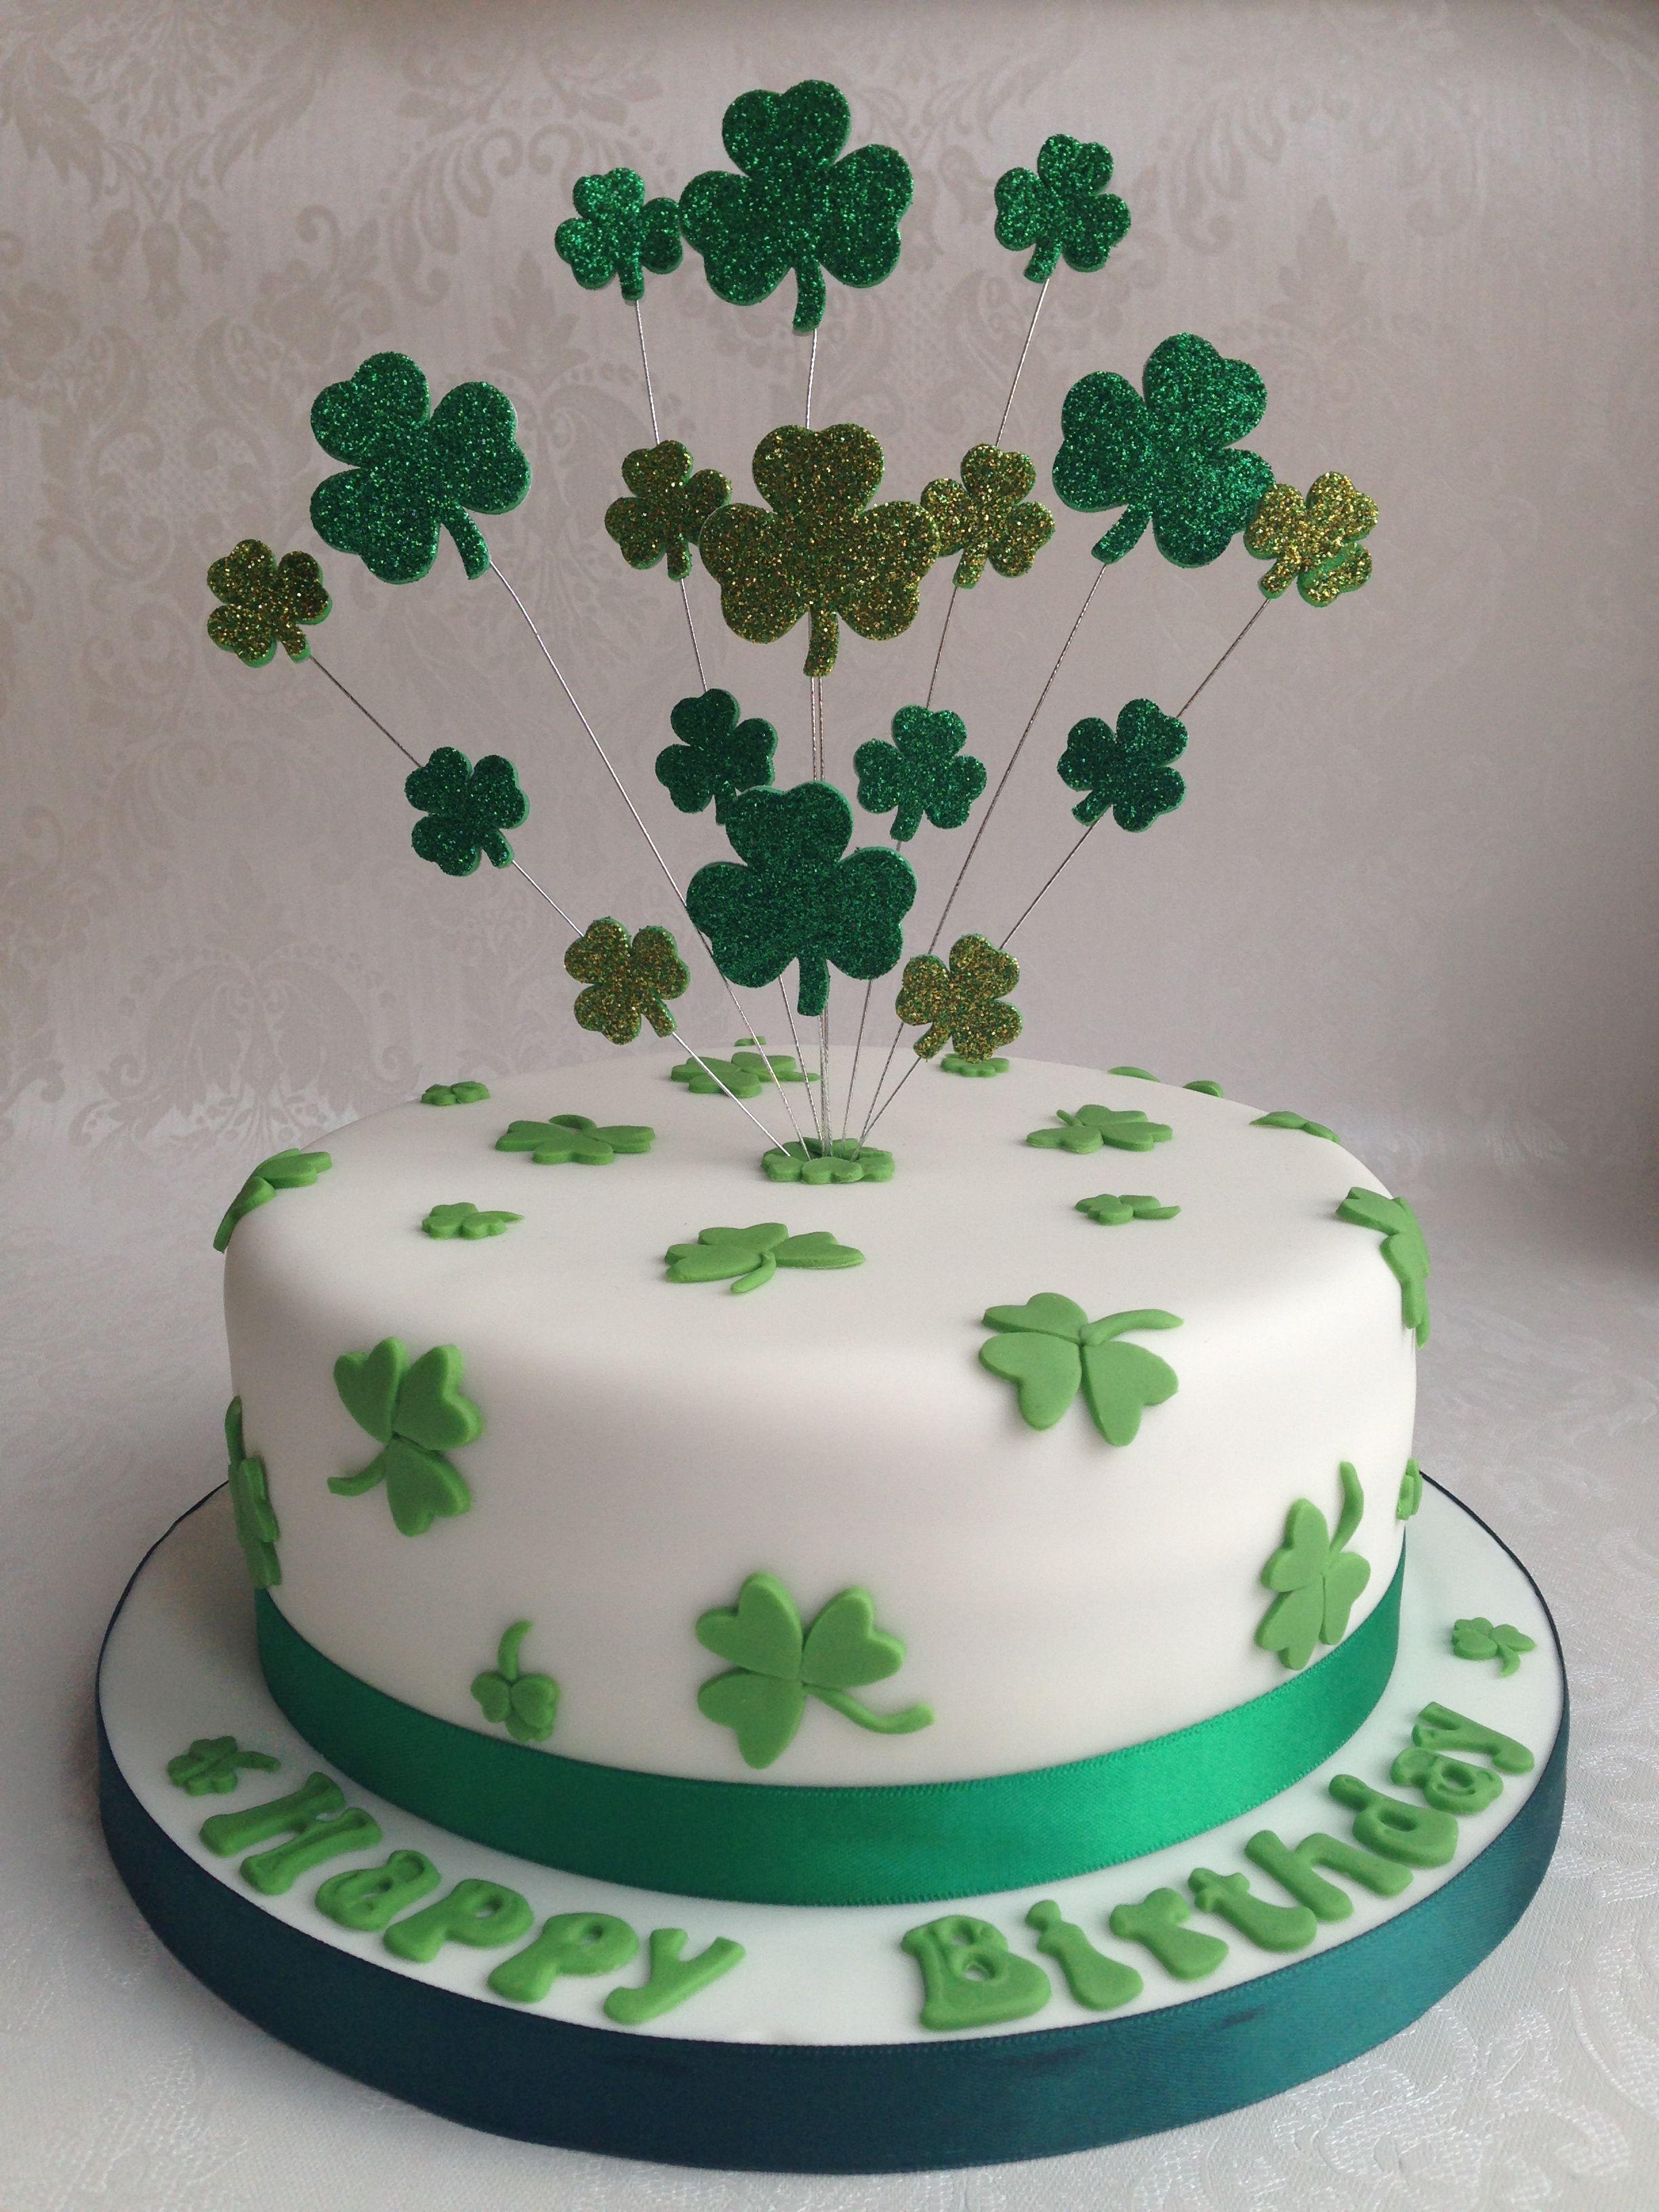 Phenomenal Irish Shamrock Cake With Images St Patricks Day Cakes Cake Birthday Cards Printable Trancafe Filternl